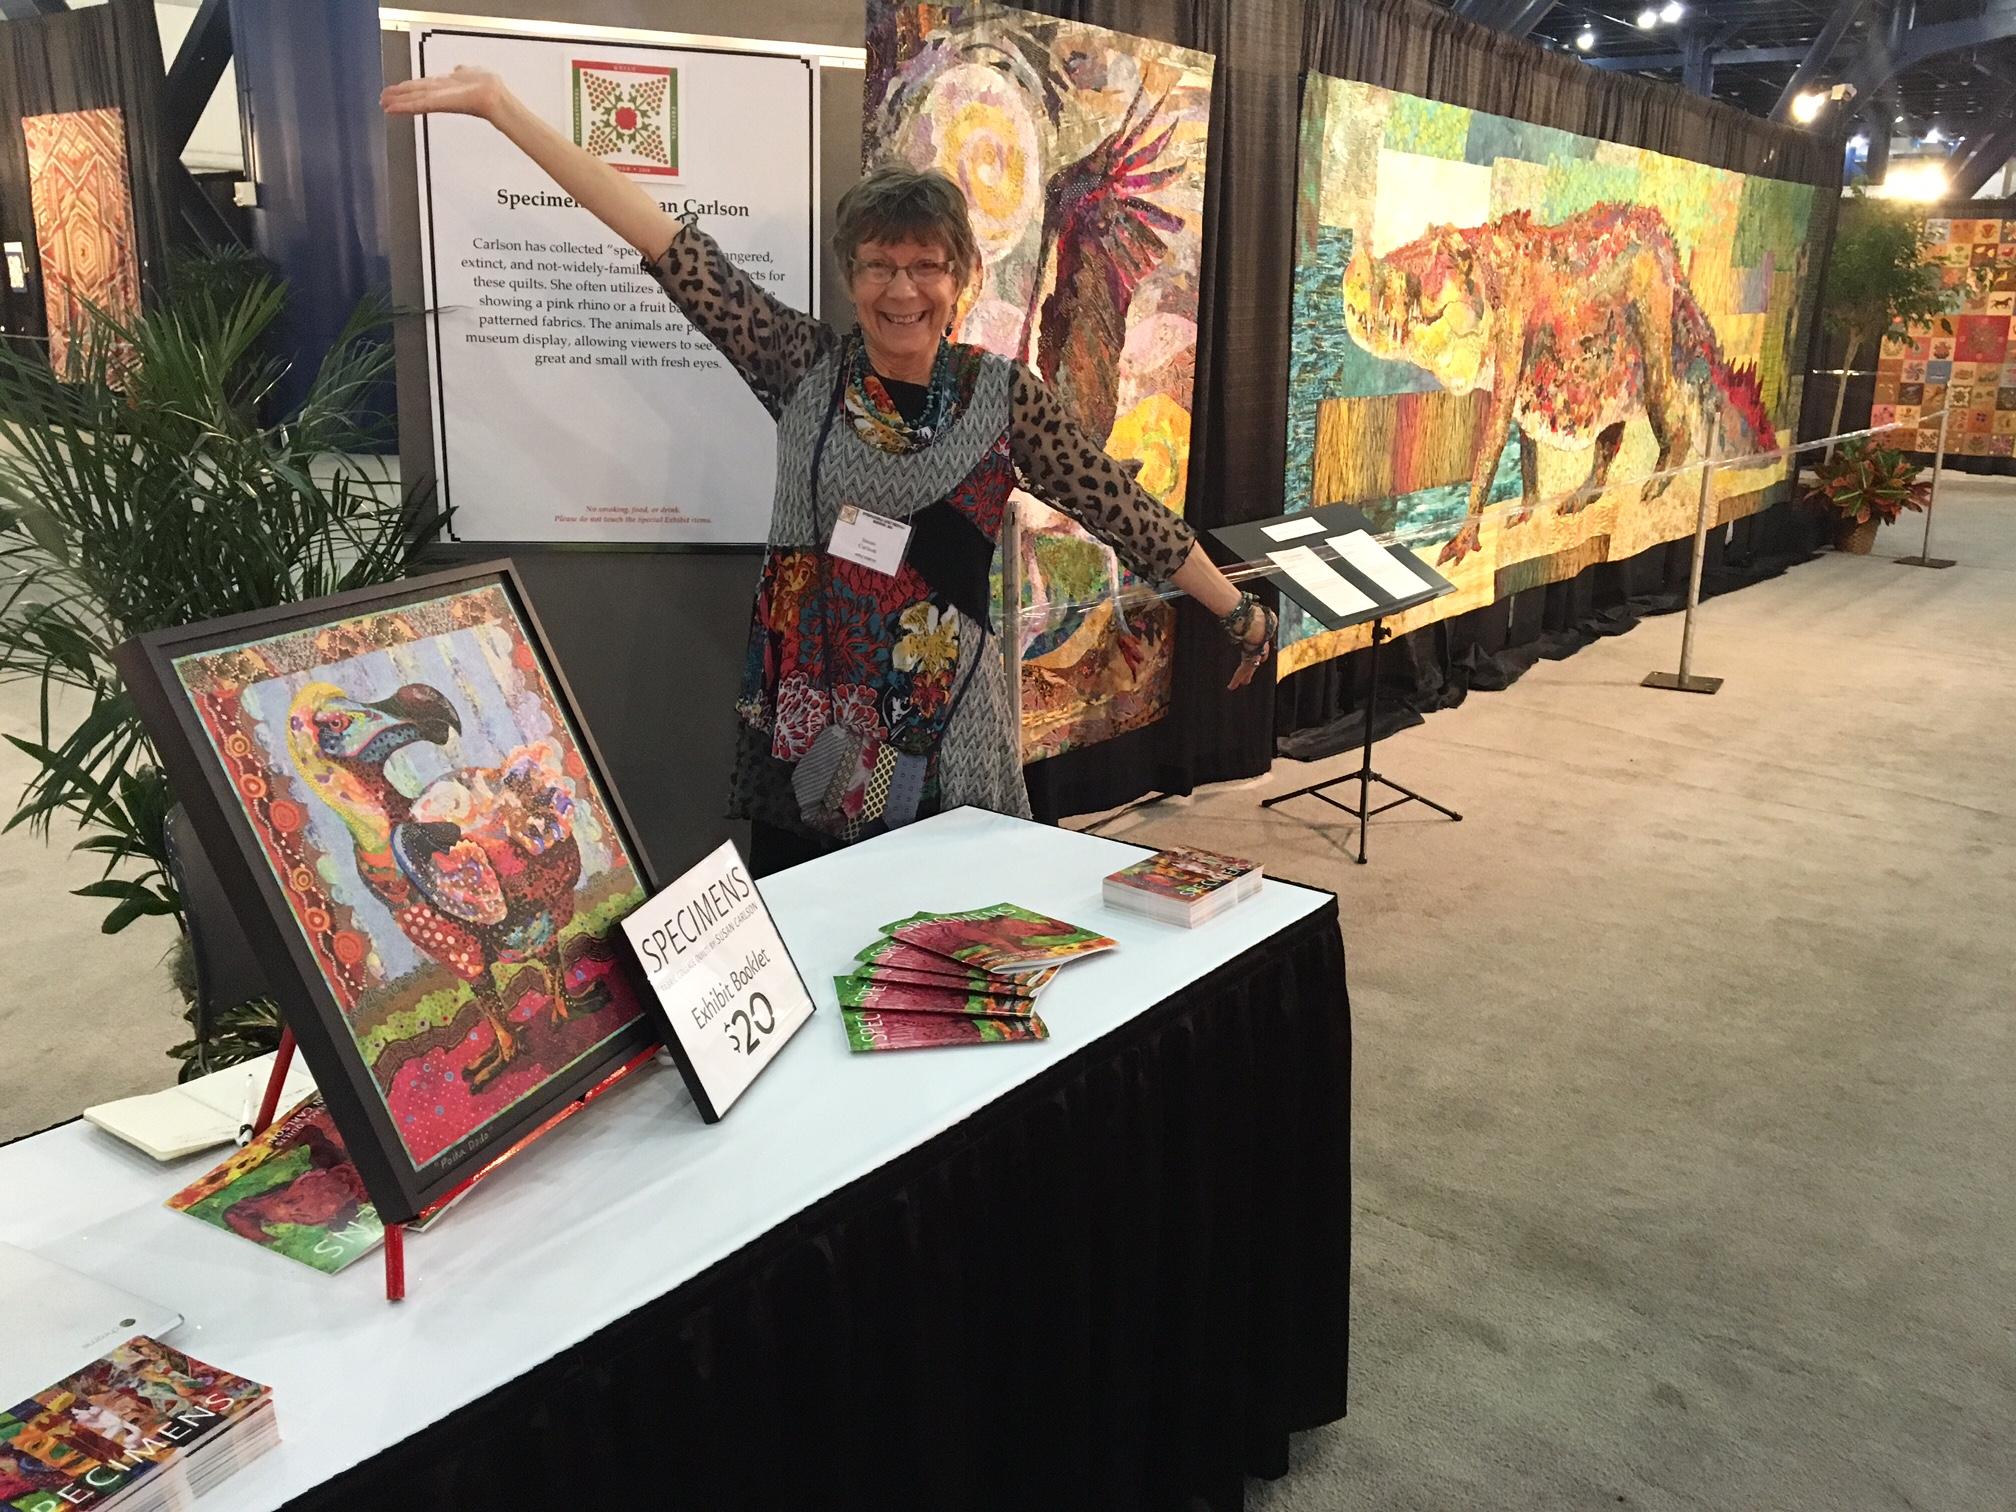 Specimens at the International Quilt Festival